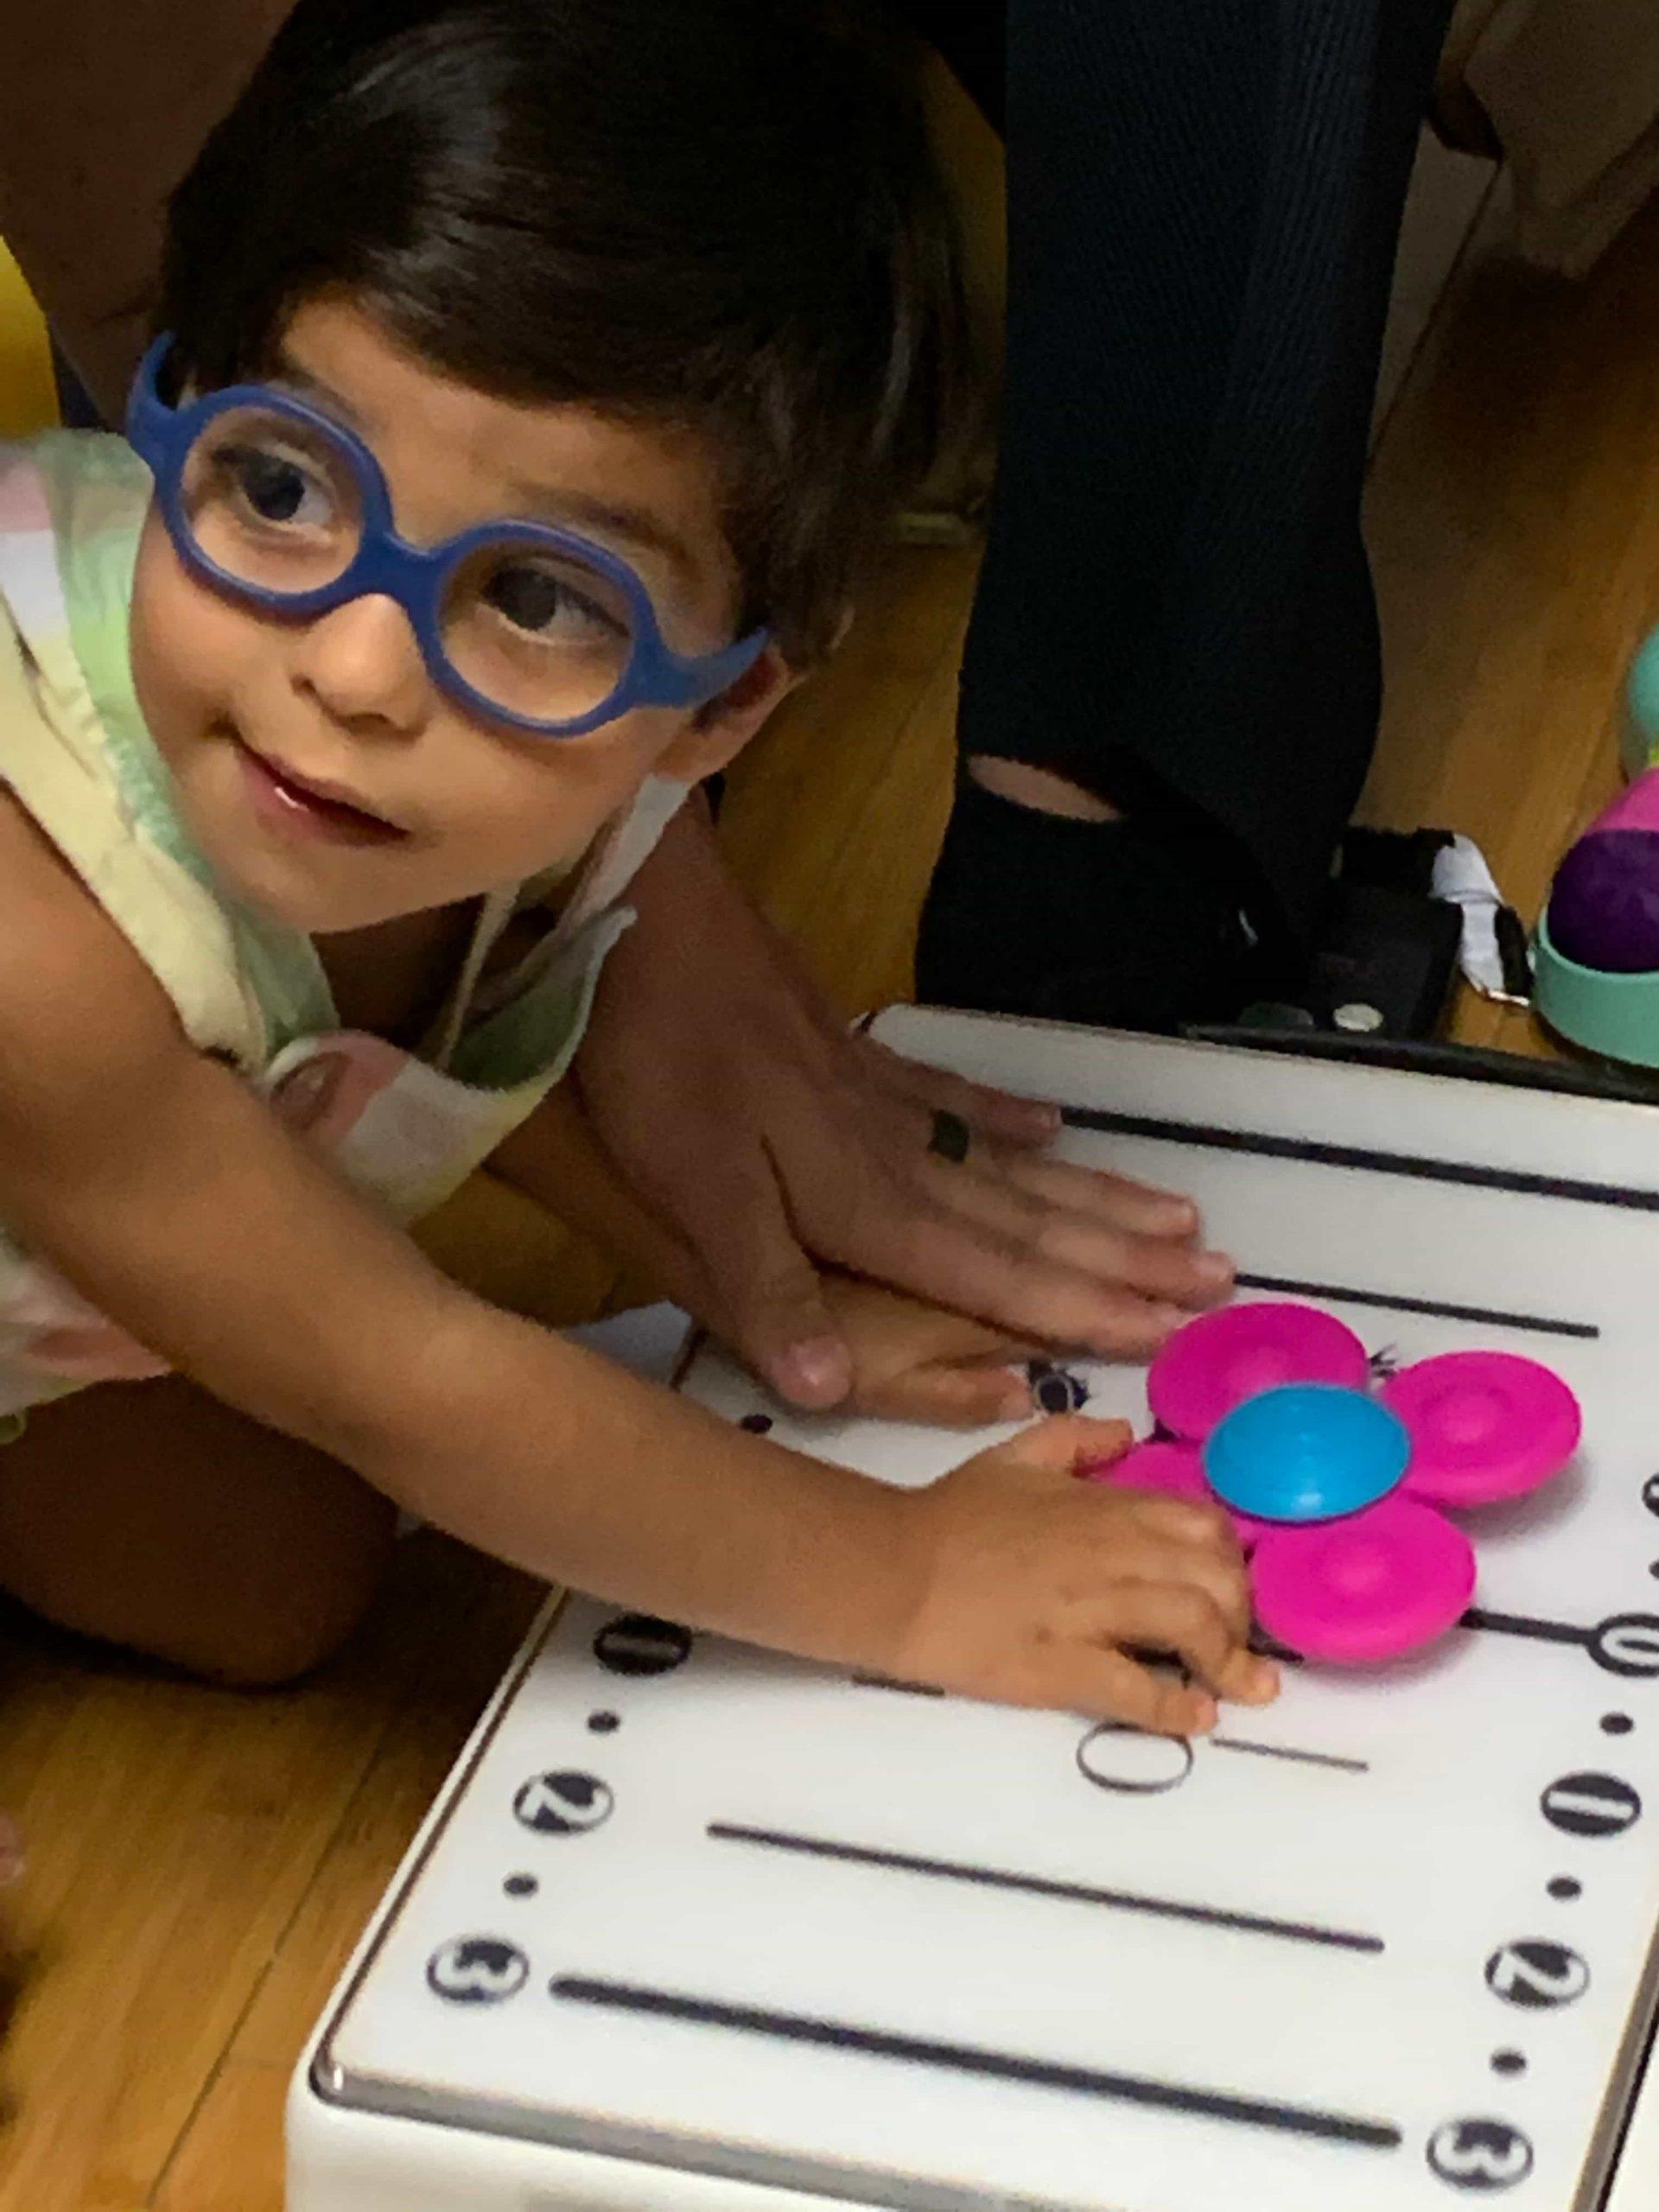 pediatric-vibration-therapy-galileo-kids